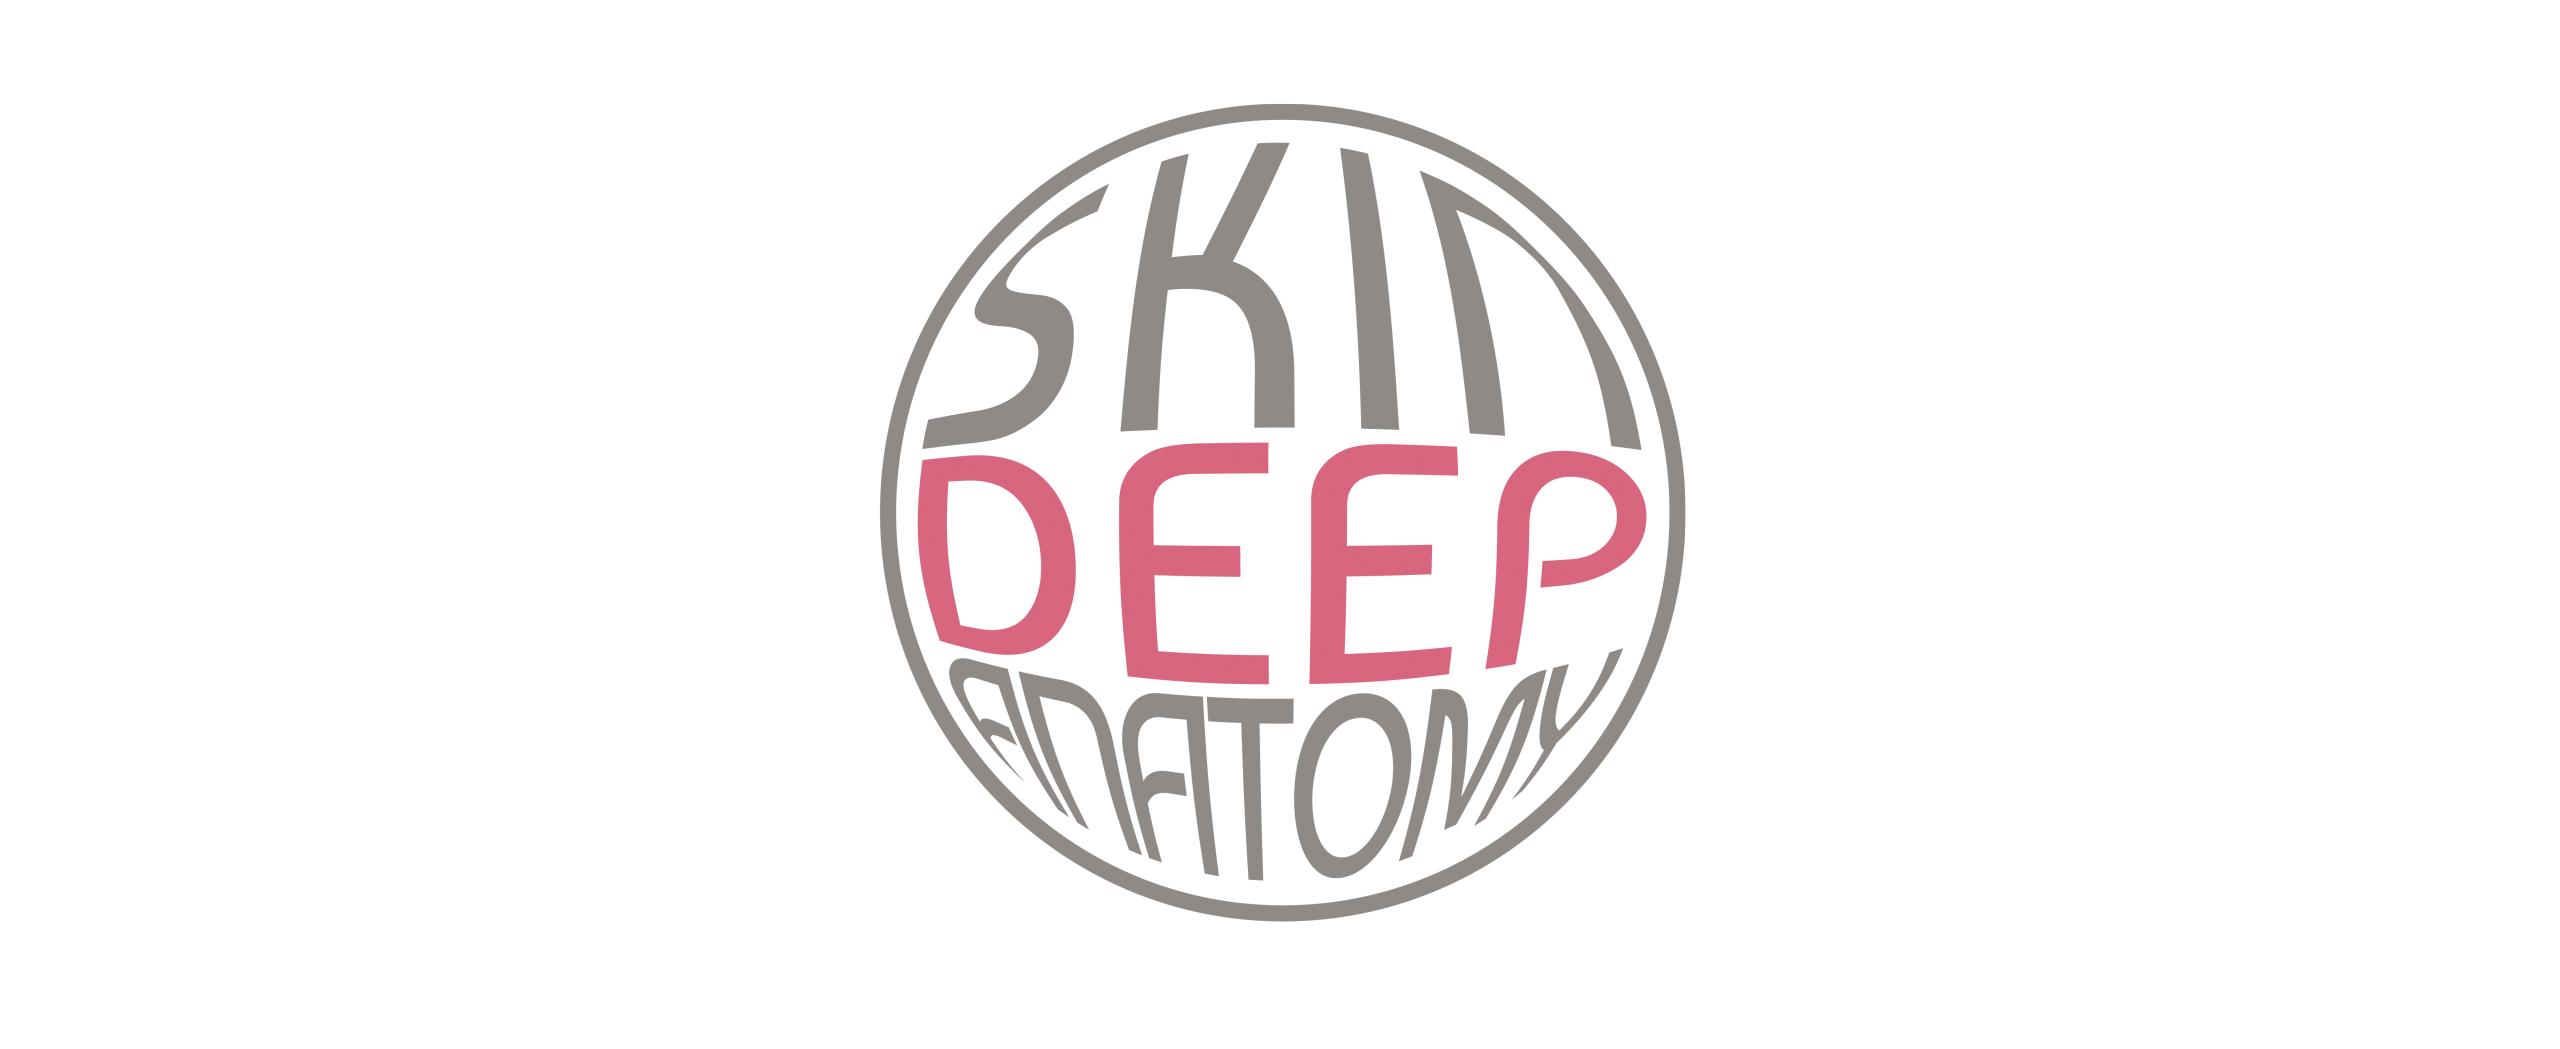 Skin Deep Anatomy